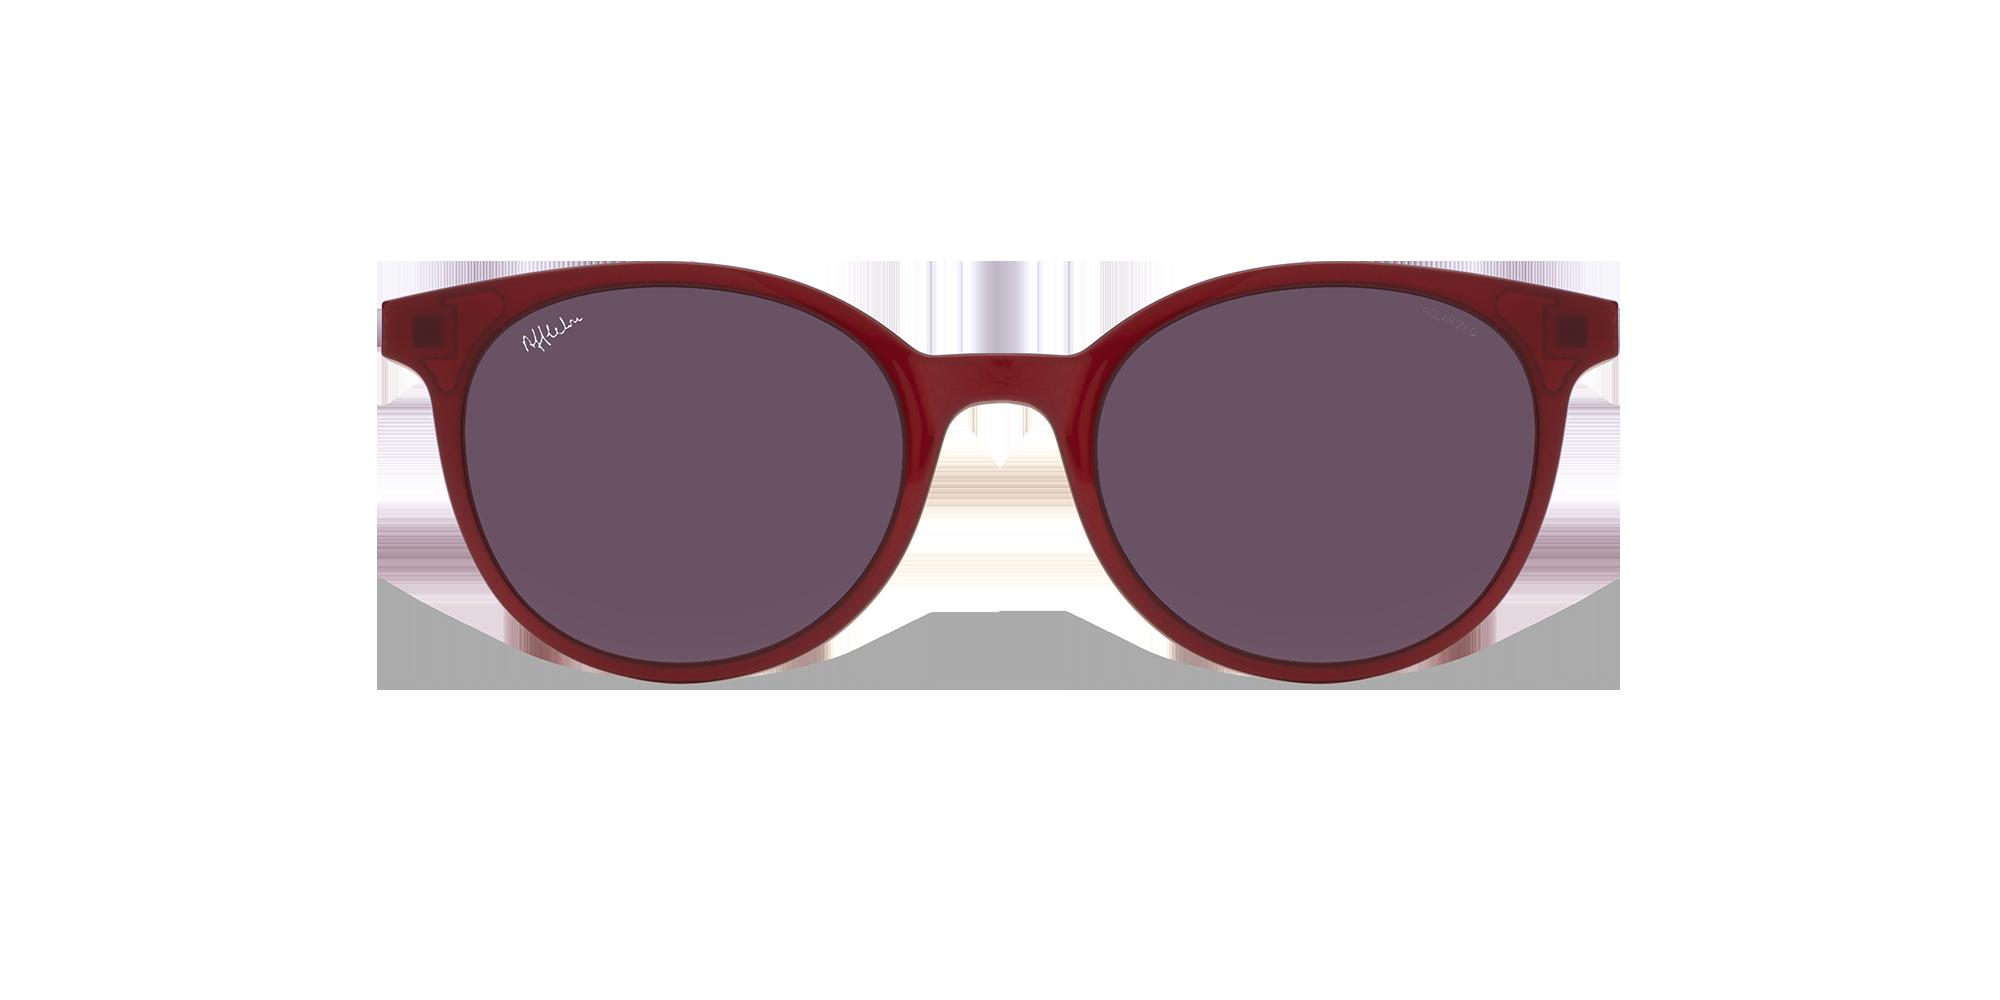 afflelou/france/products/smart_clip/clips_glasses/TMK36PORD014819.png